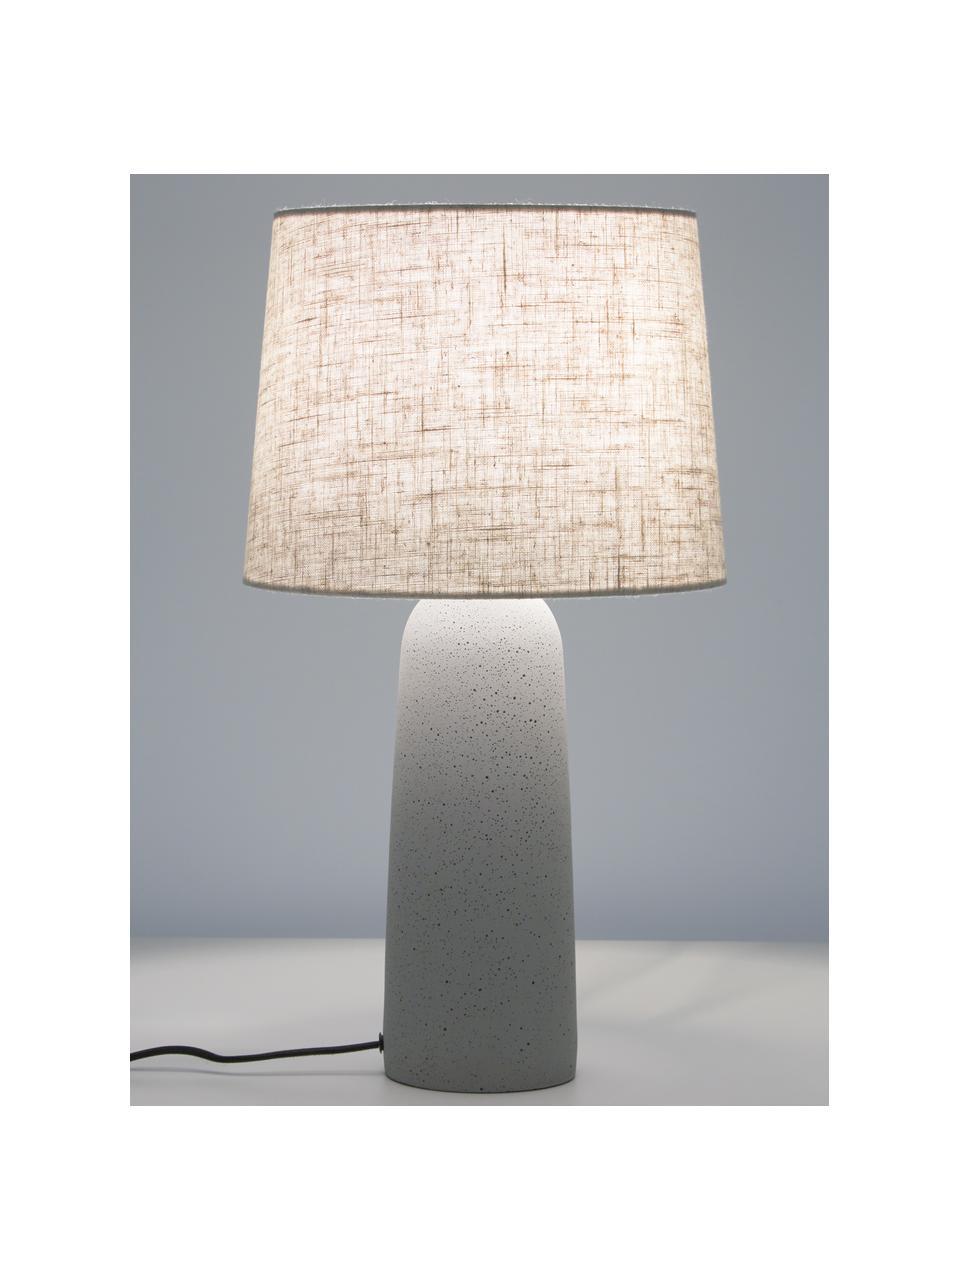 Grote tafellamp Kaya met betonnen voet, Lampenkap: 70% katoen, 30% linnen, Lampvoet: beton, Beige, Ø 29 x H 52 cm